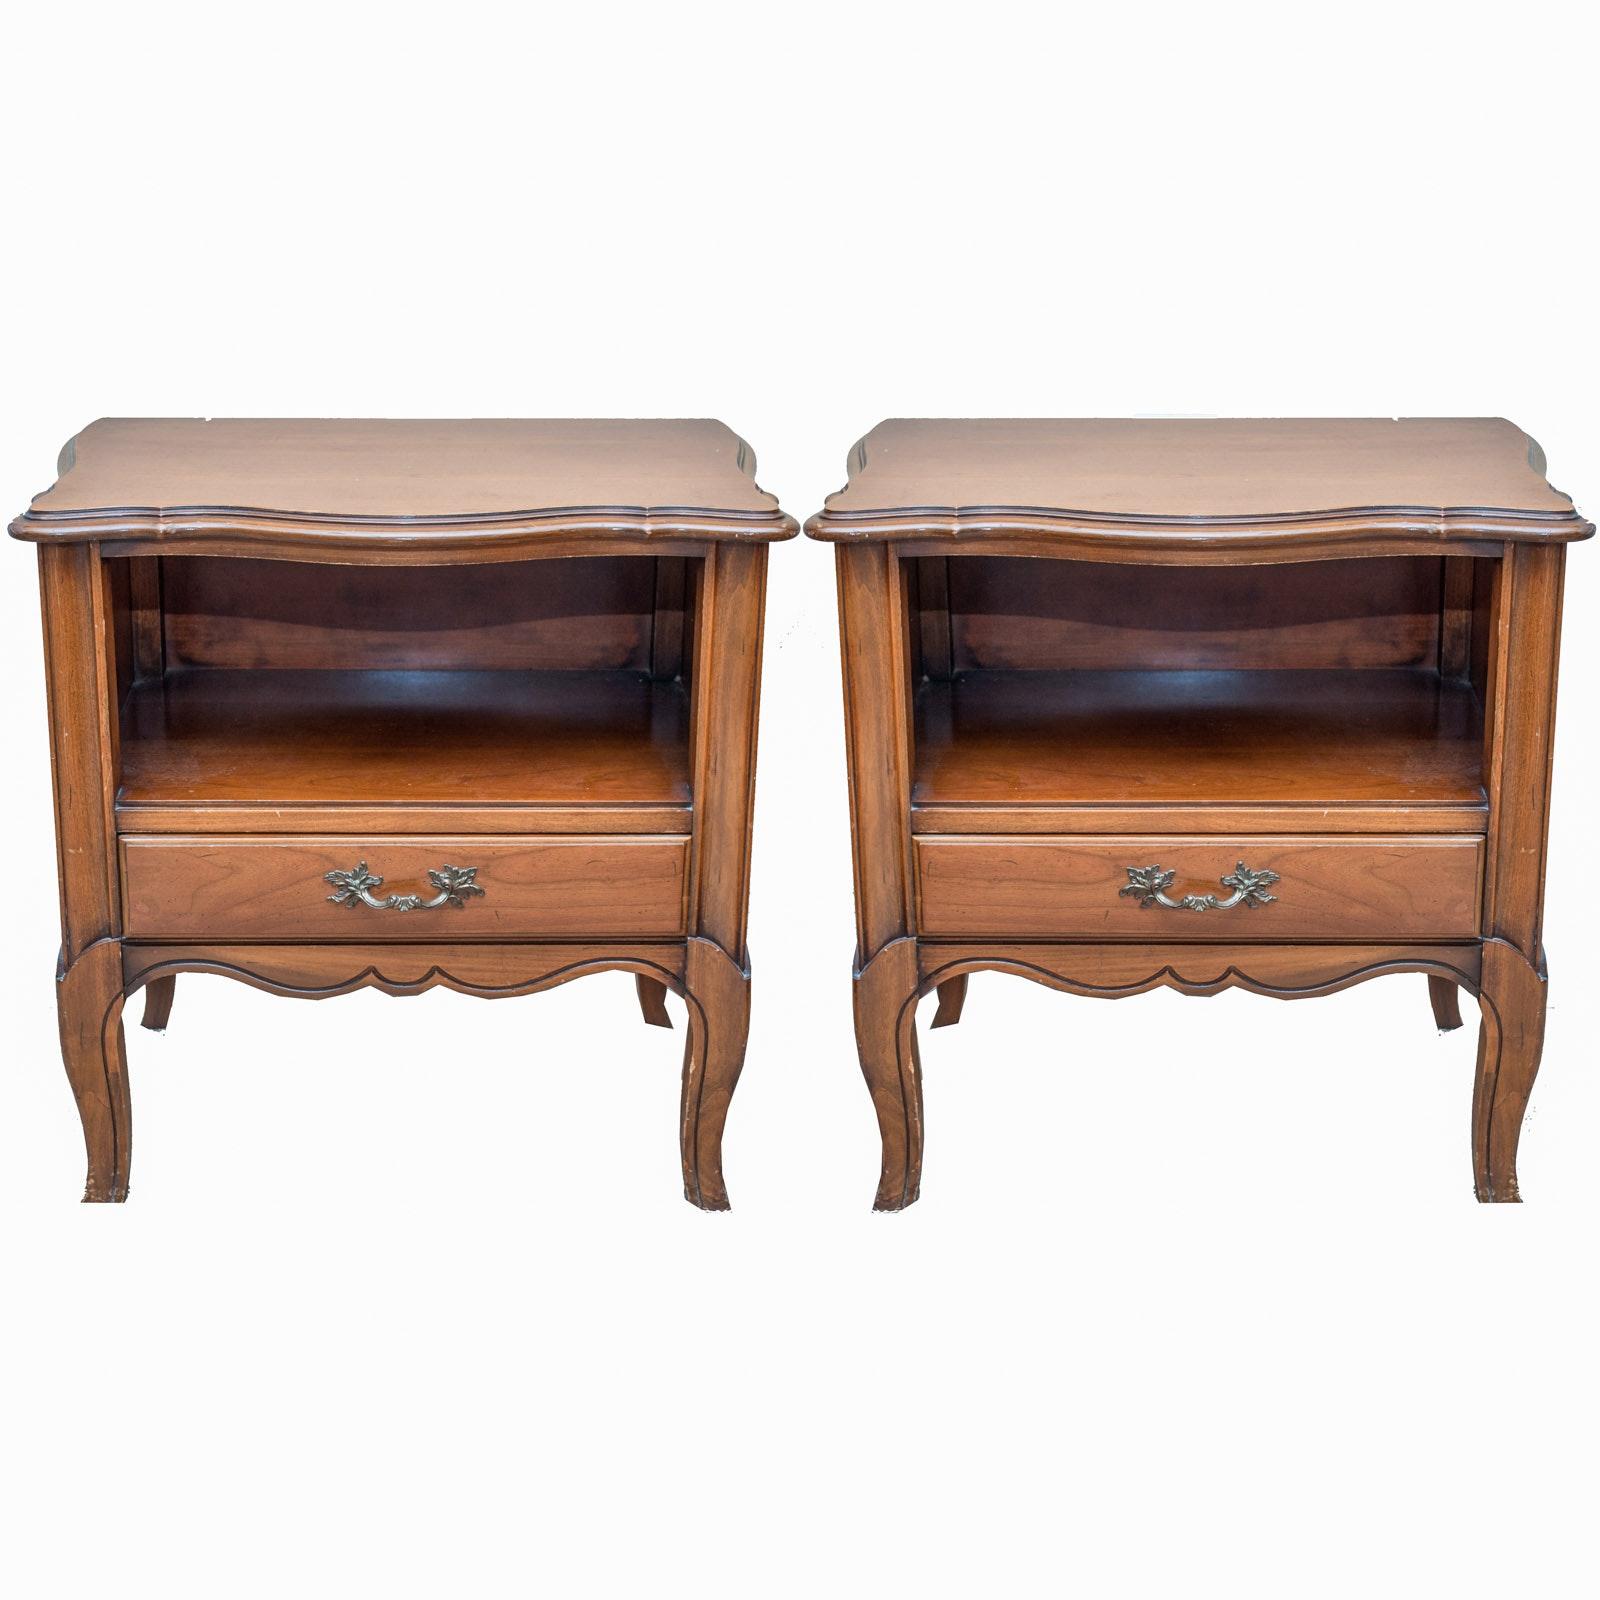 "Pair of Vintage National Furniture Co. ""Salem Cherry"" End Tables"